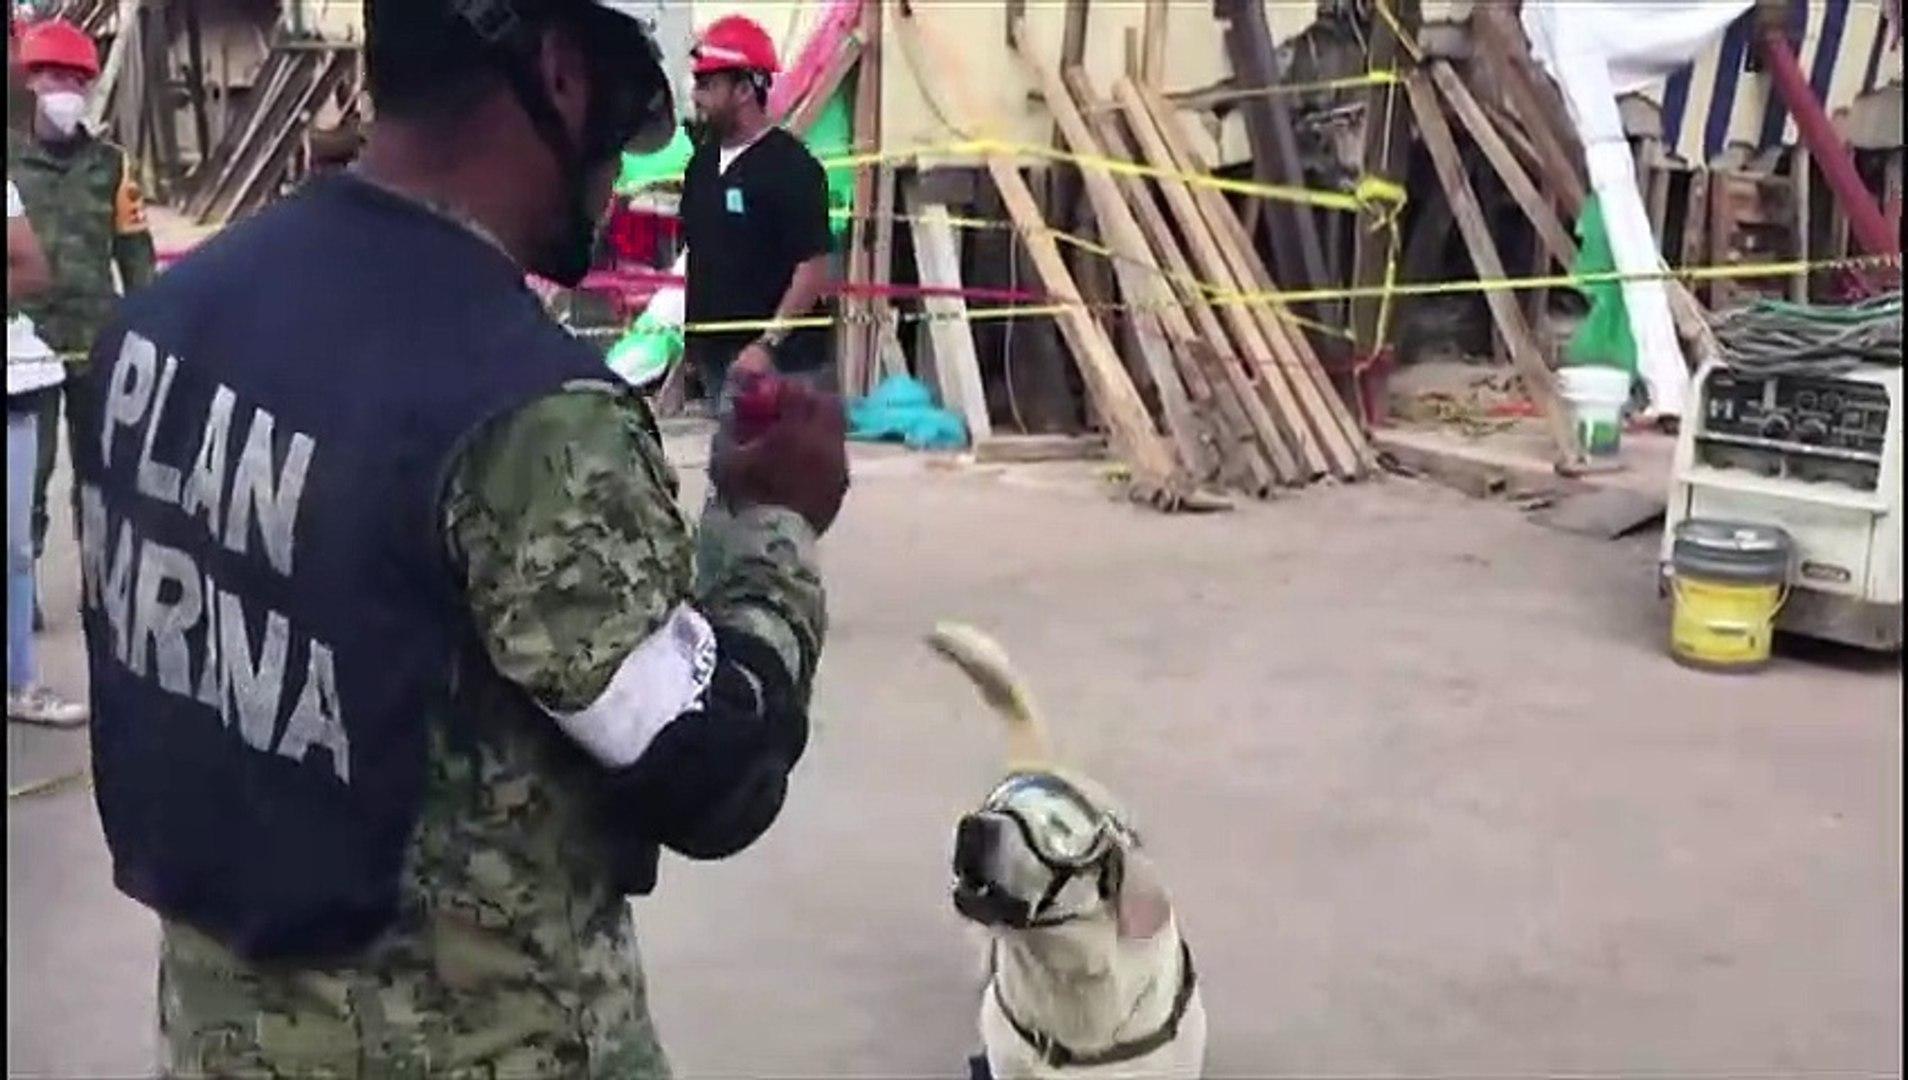 Frida, a cadela 'heroína', se aposenta